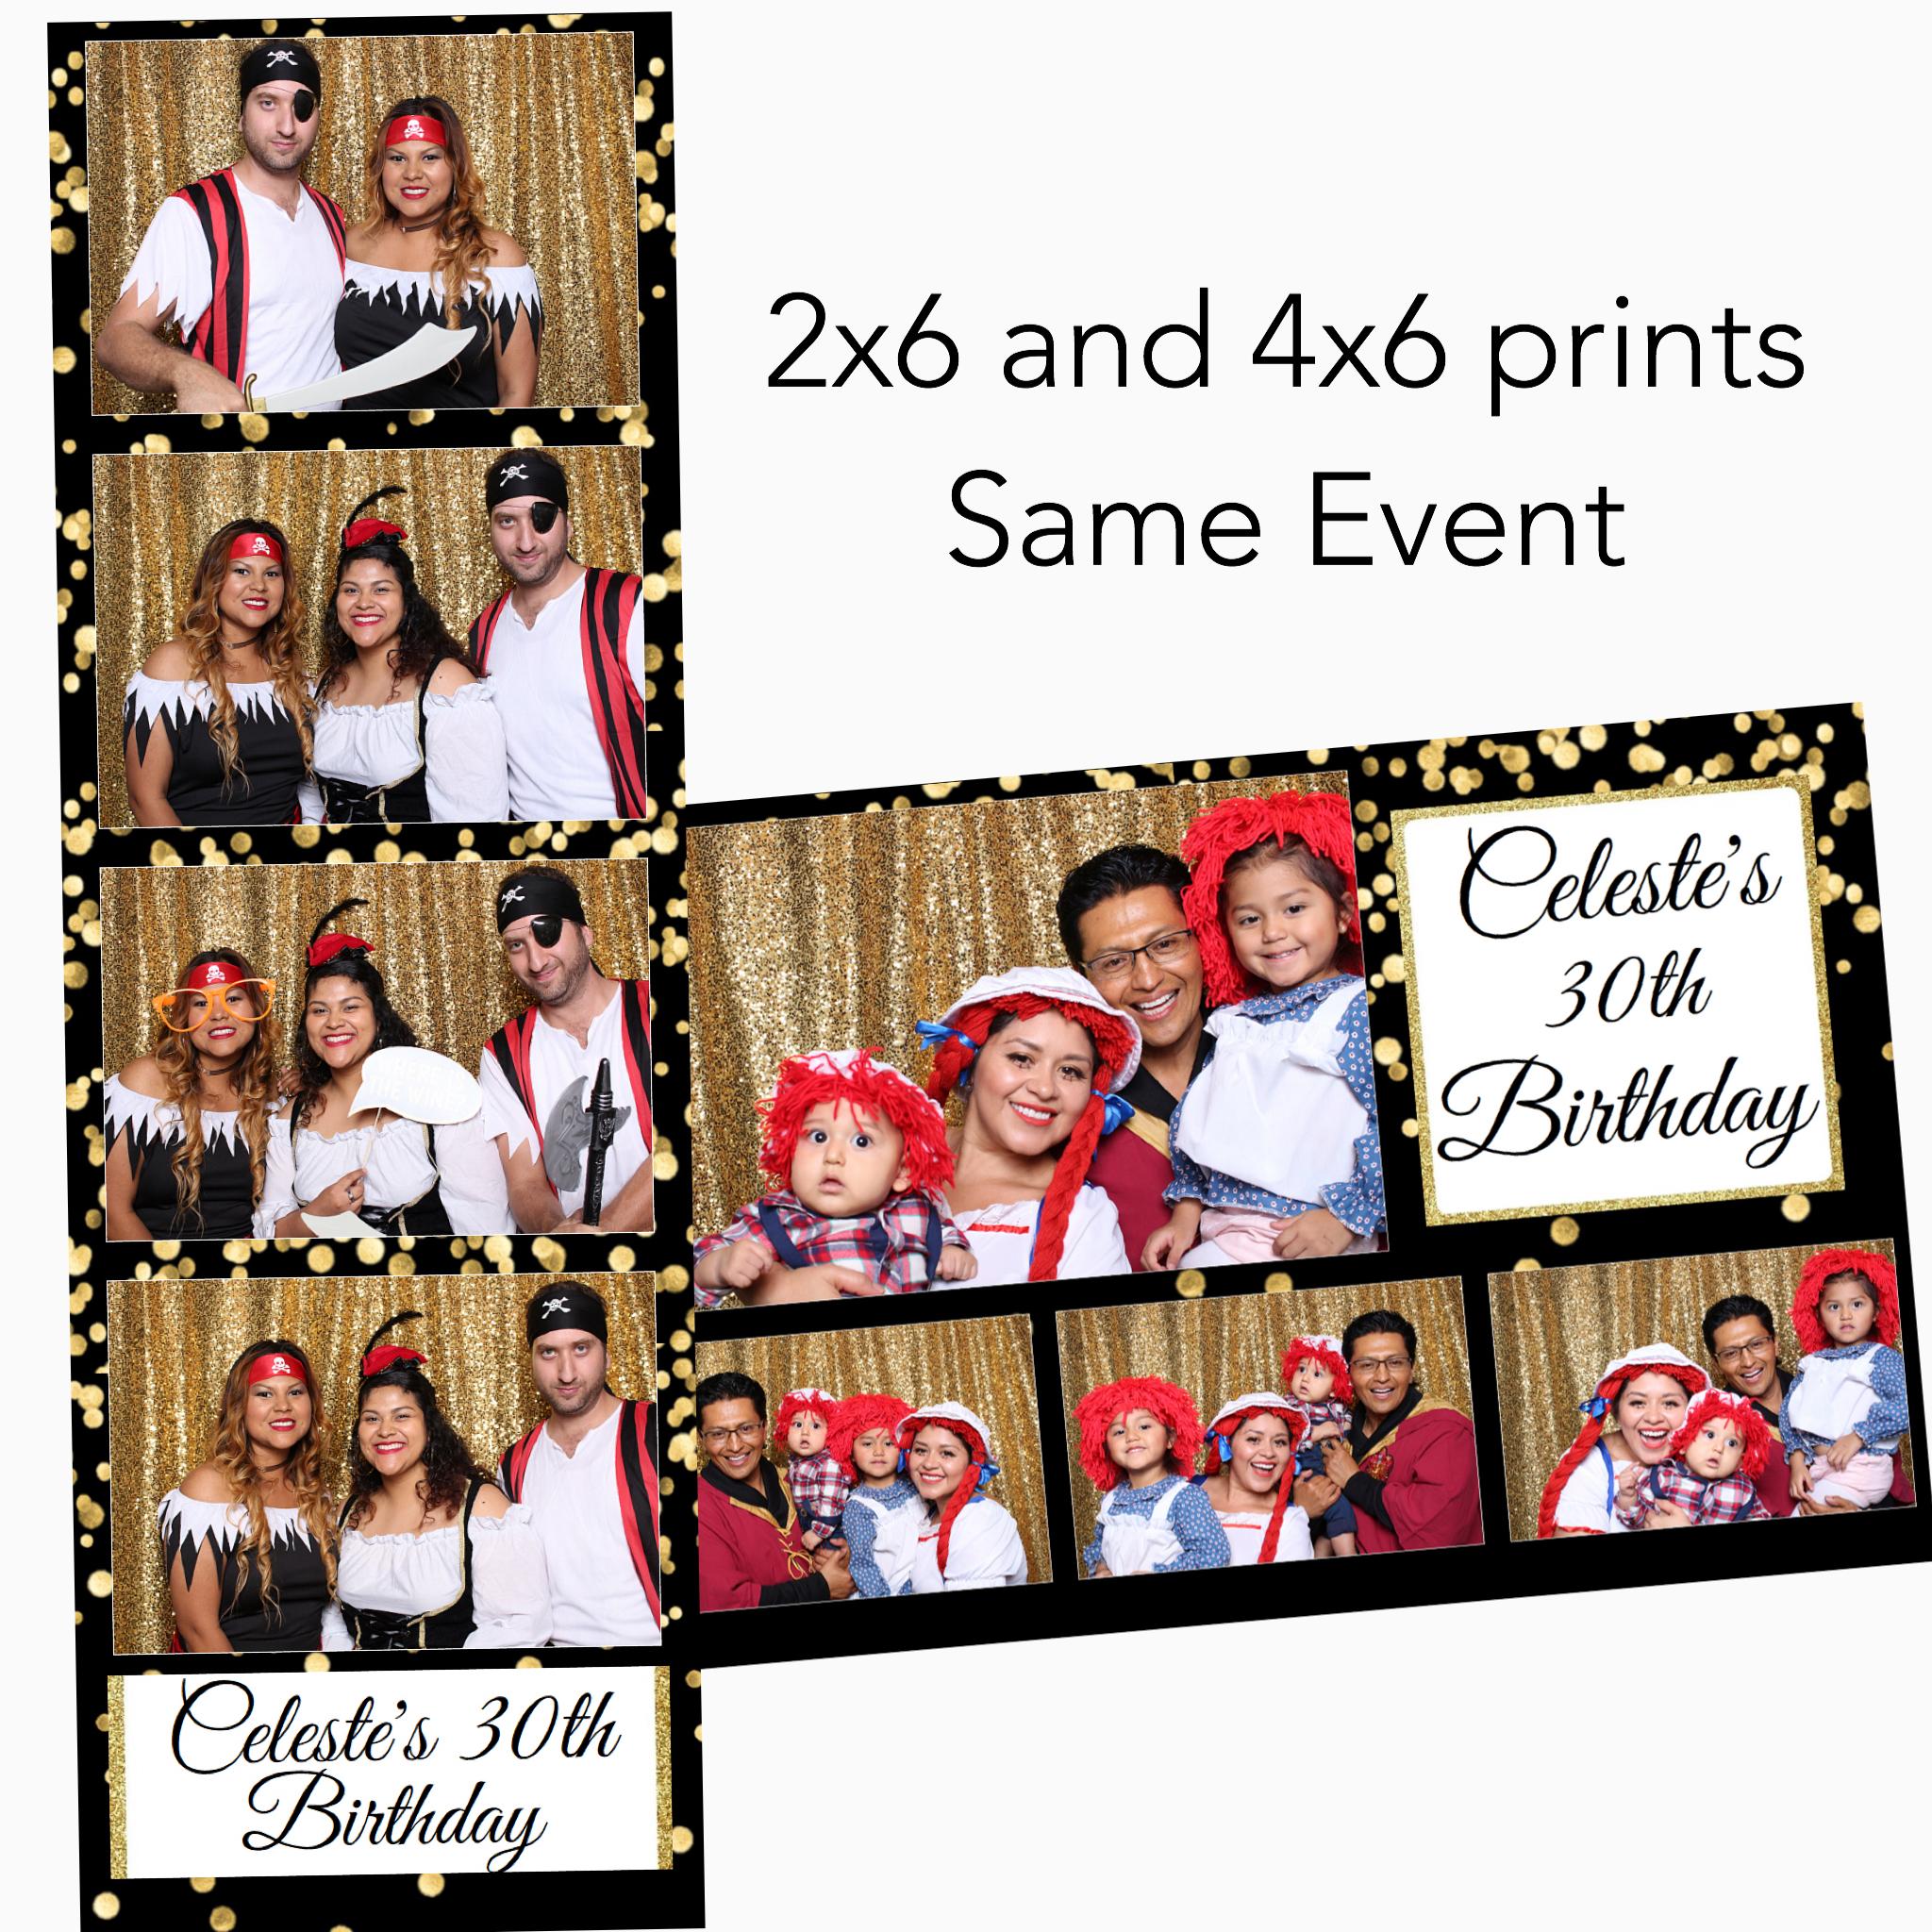 4x6 prints.JPG